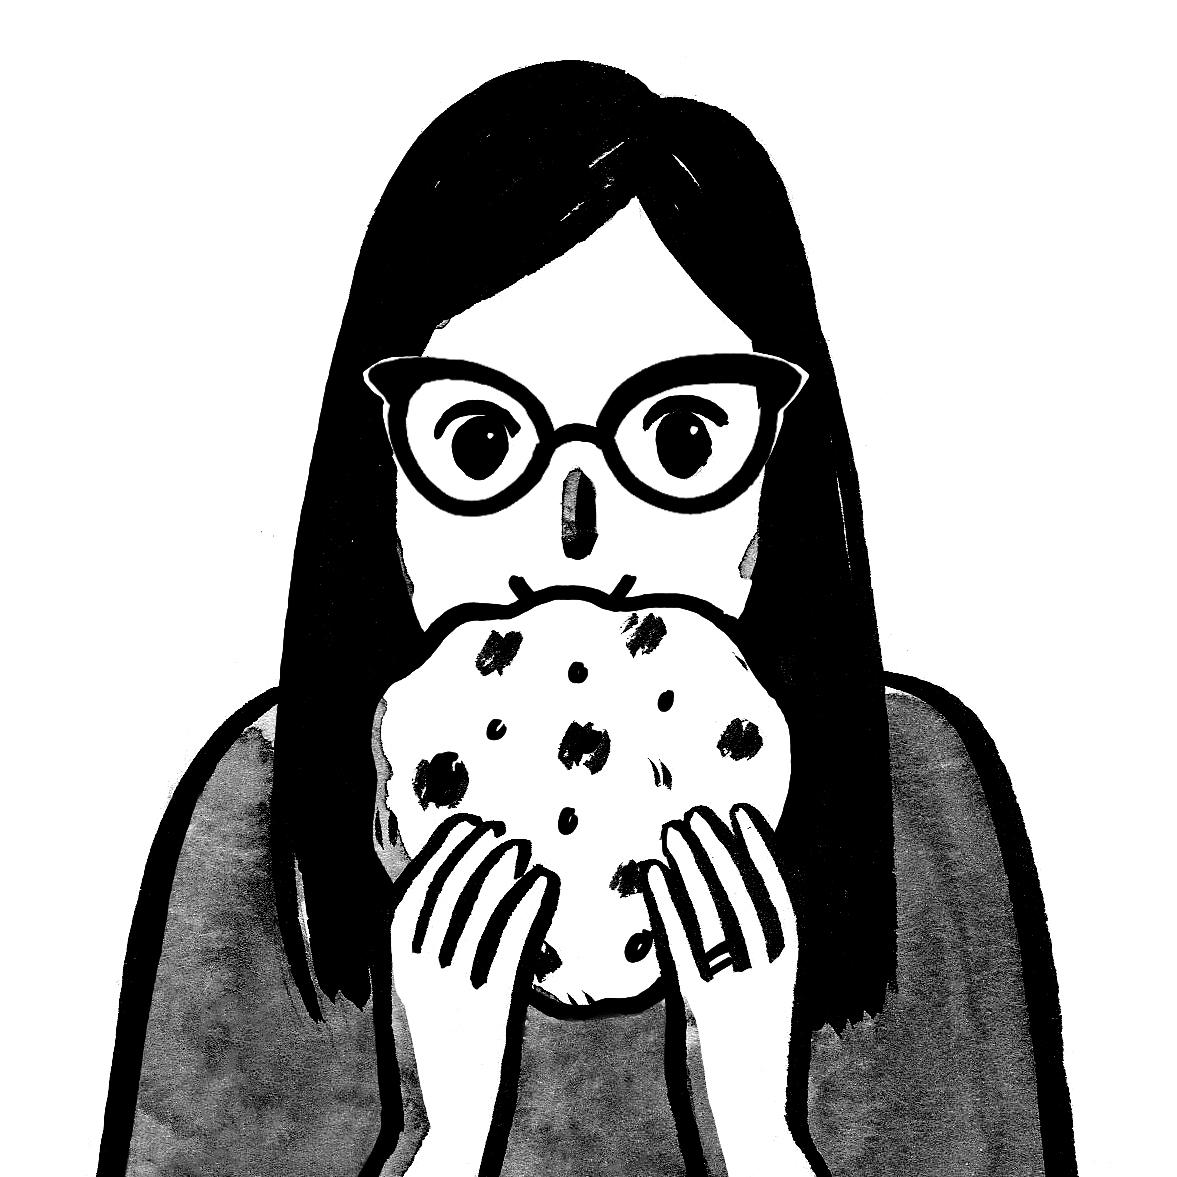 Paulina Barrack avatar by Agnes Lee